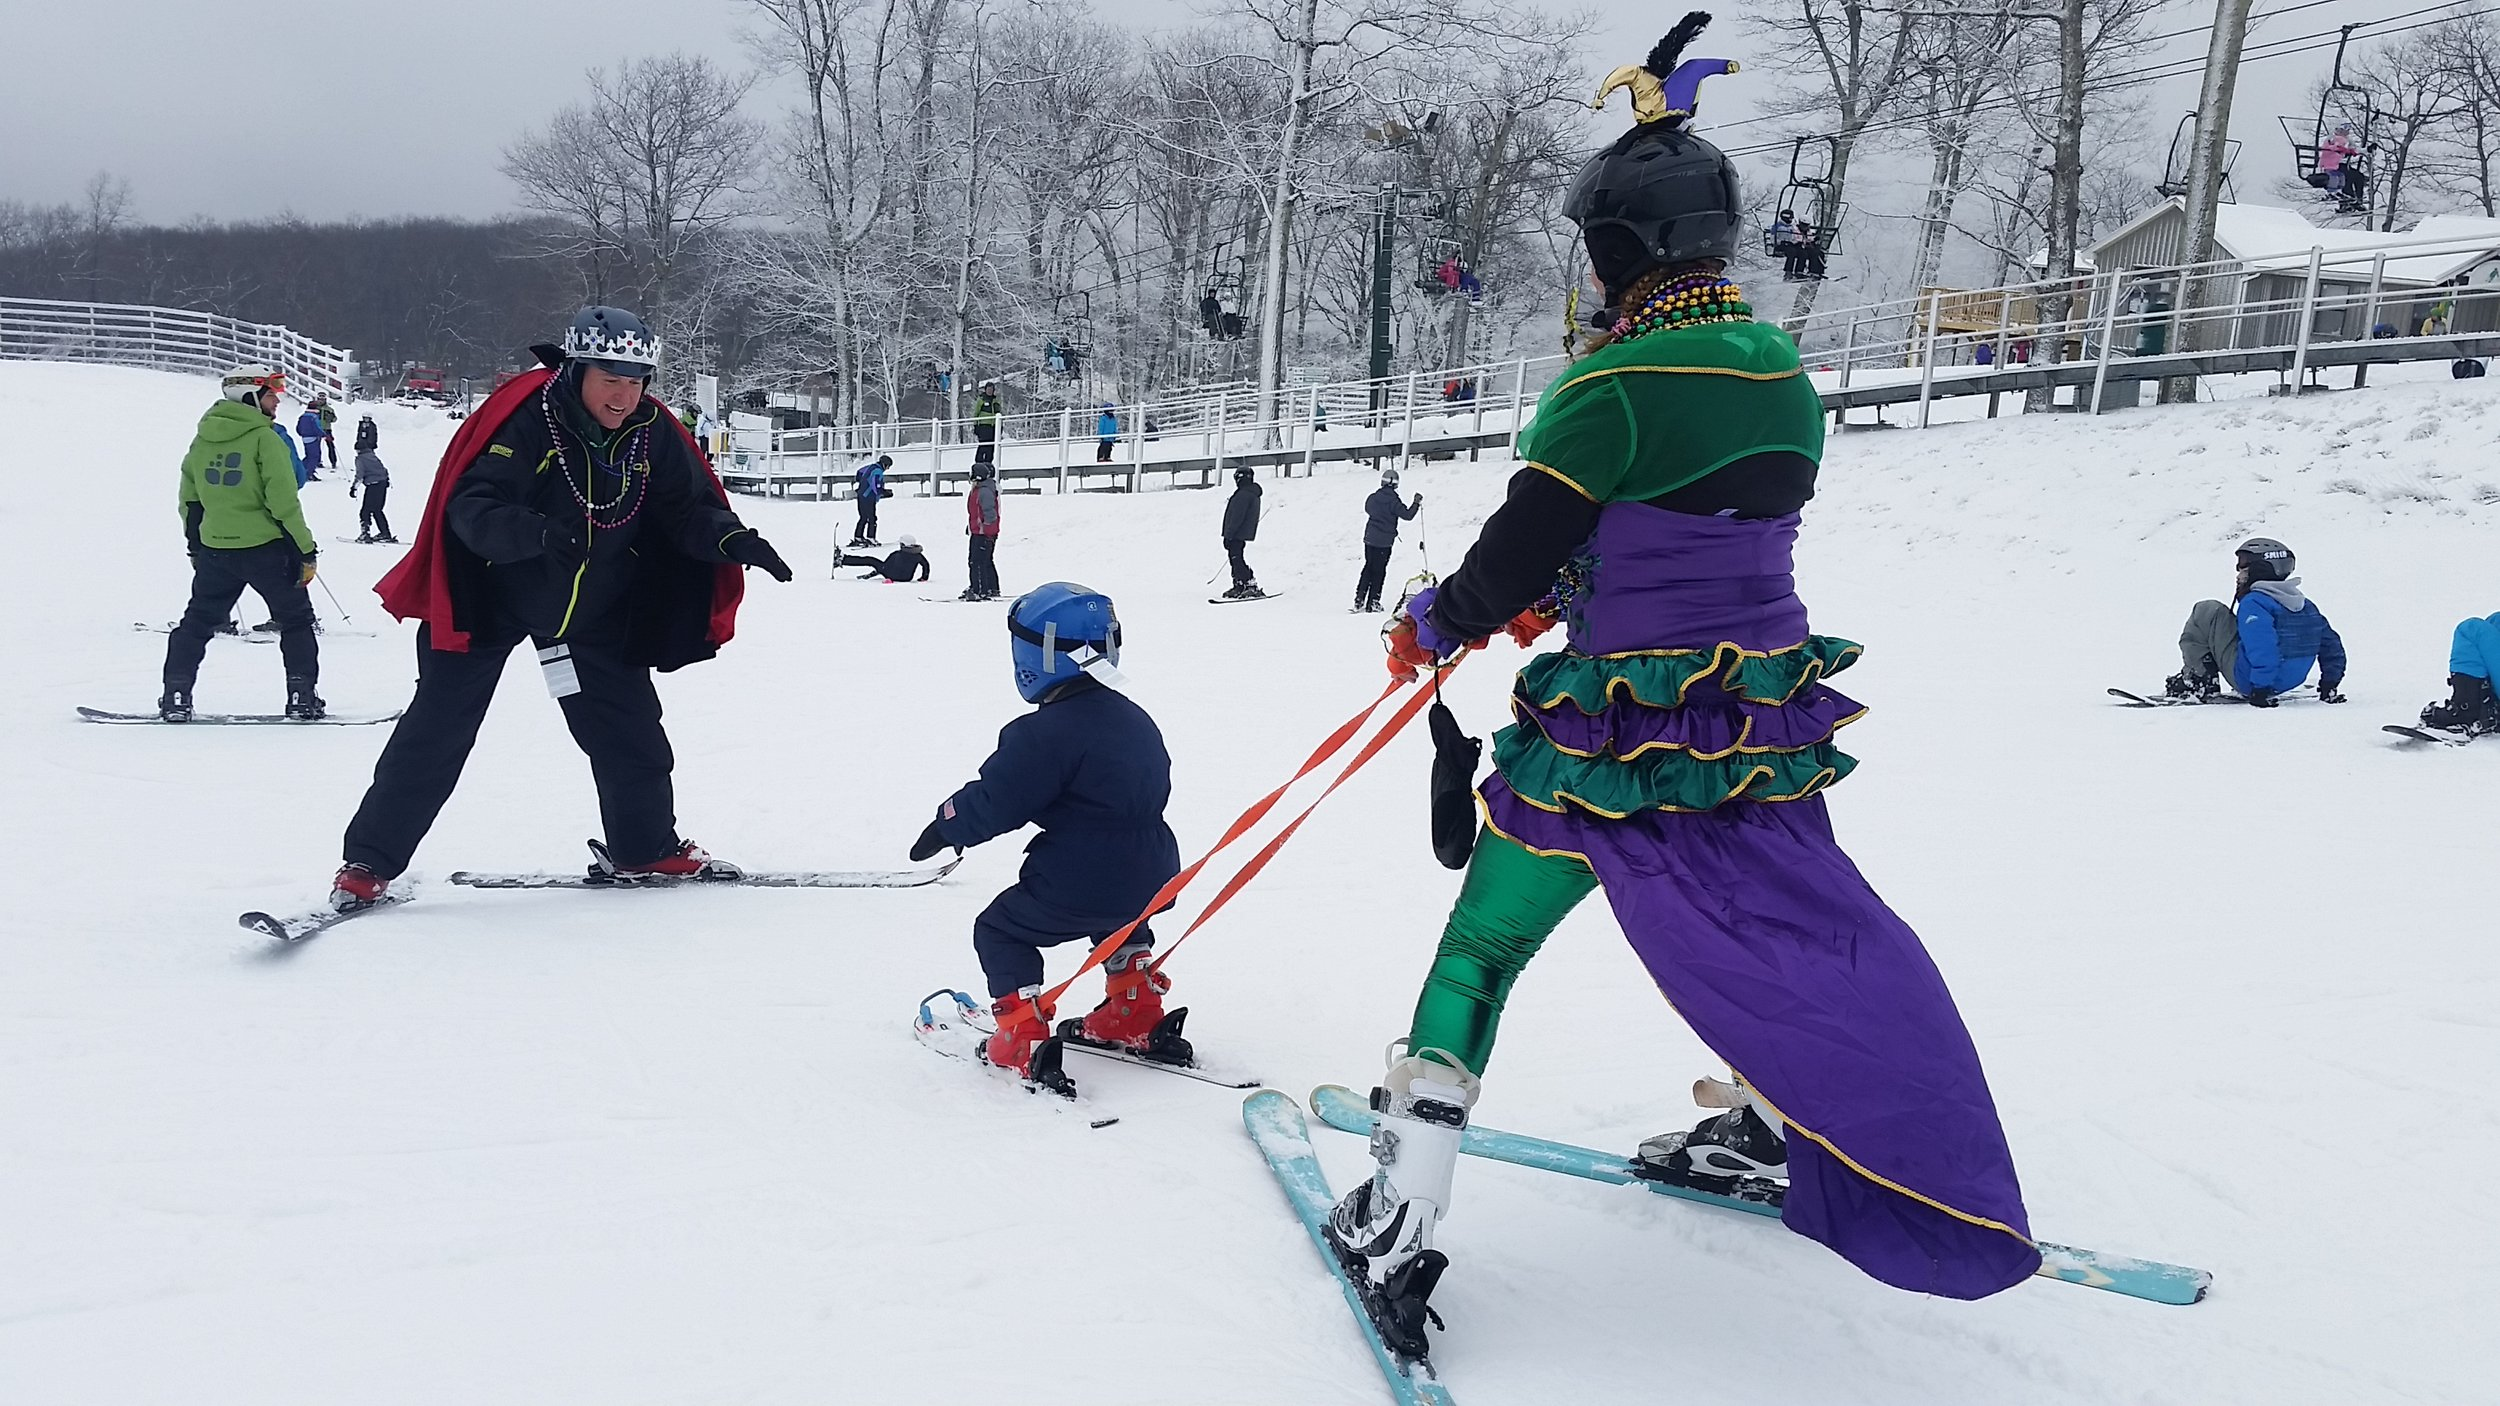 adaptive sports teaching ski WTG.jpg